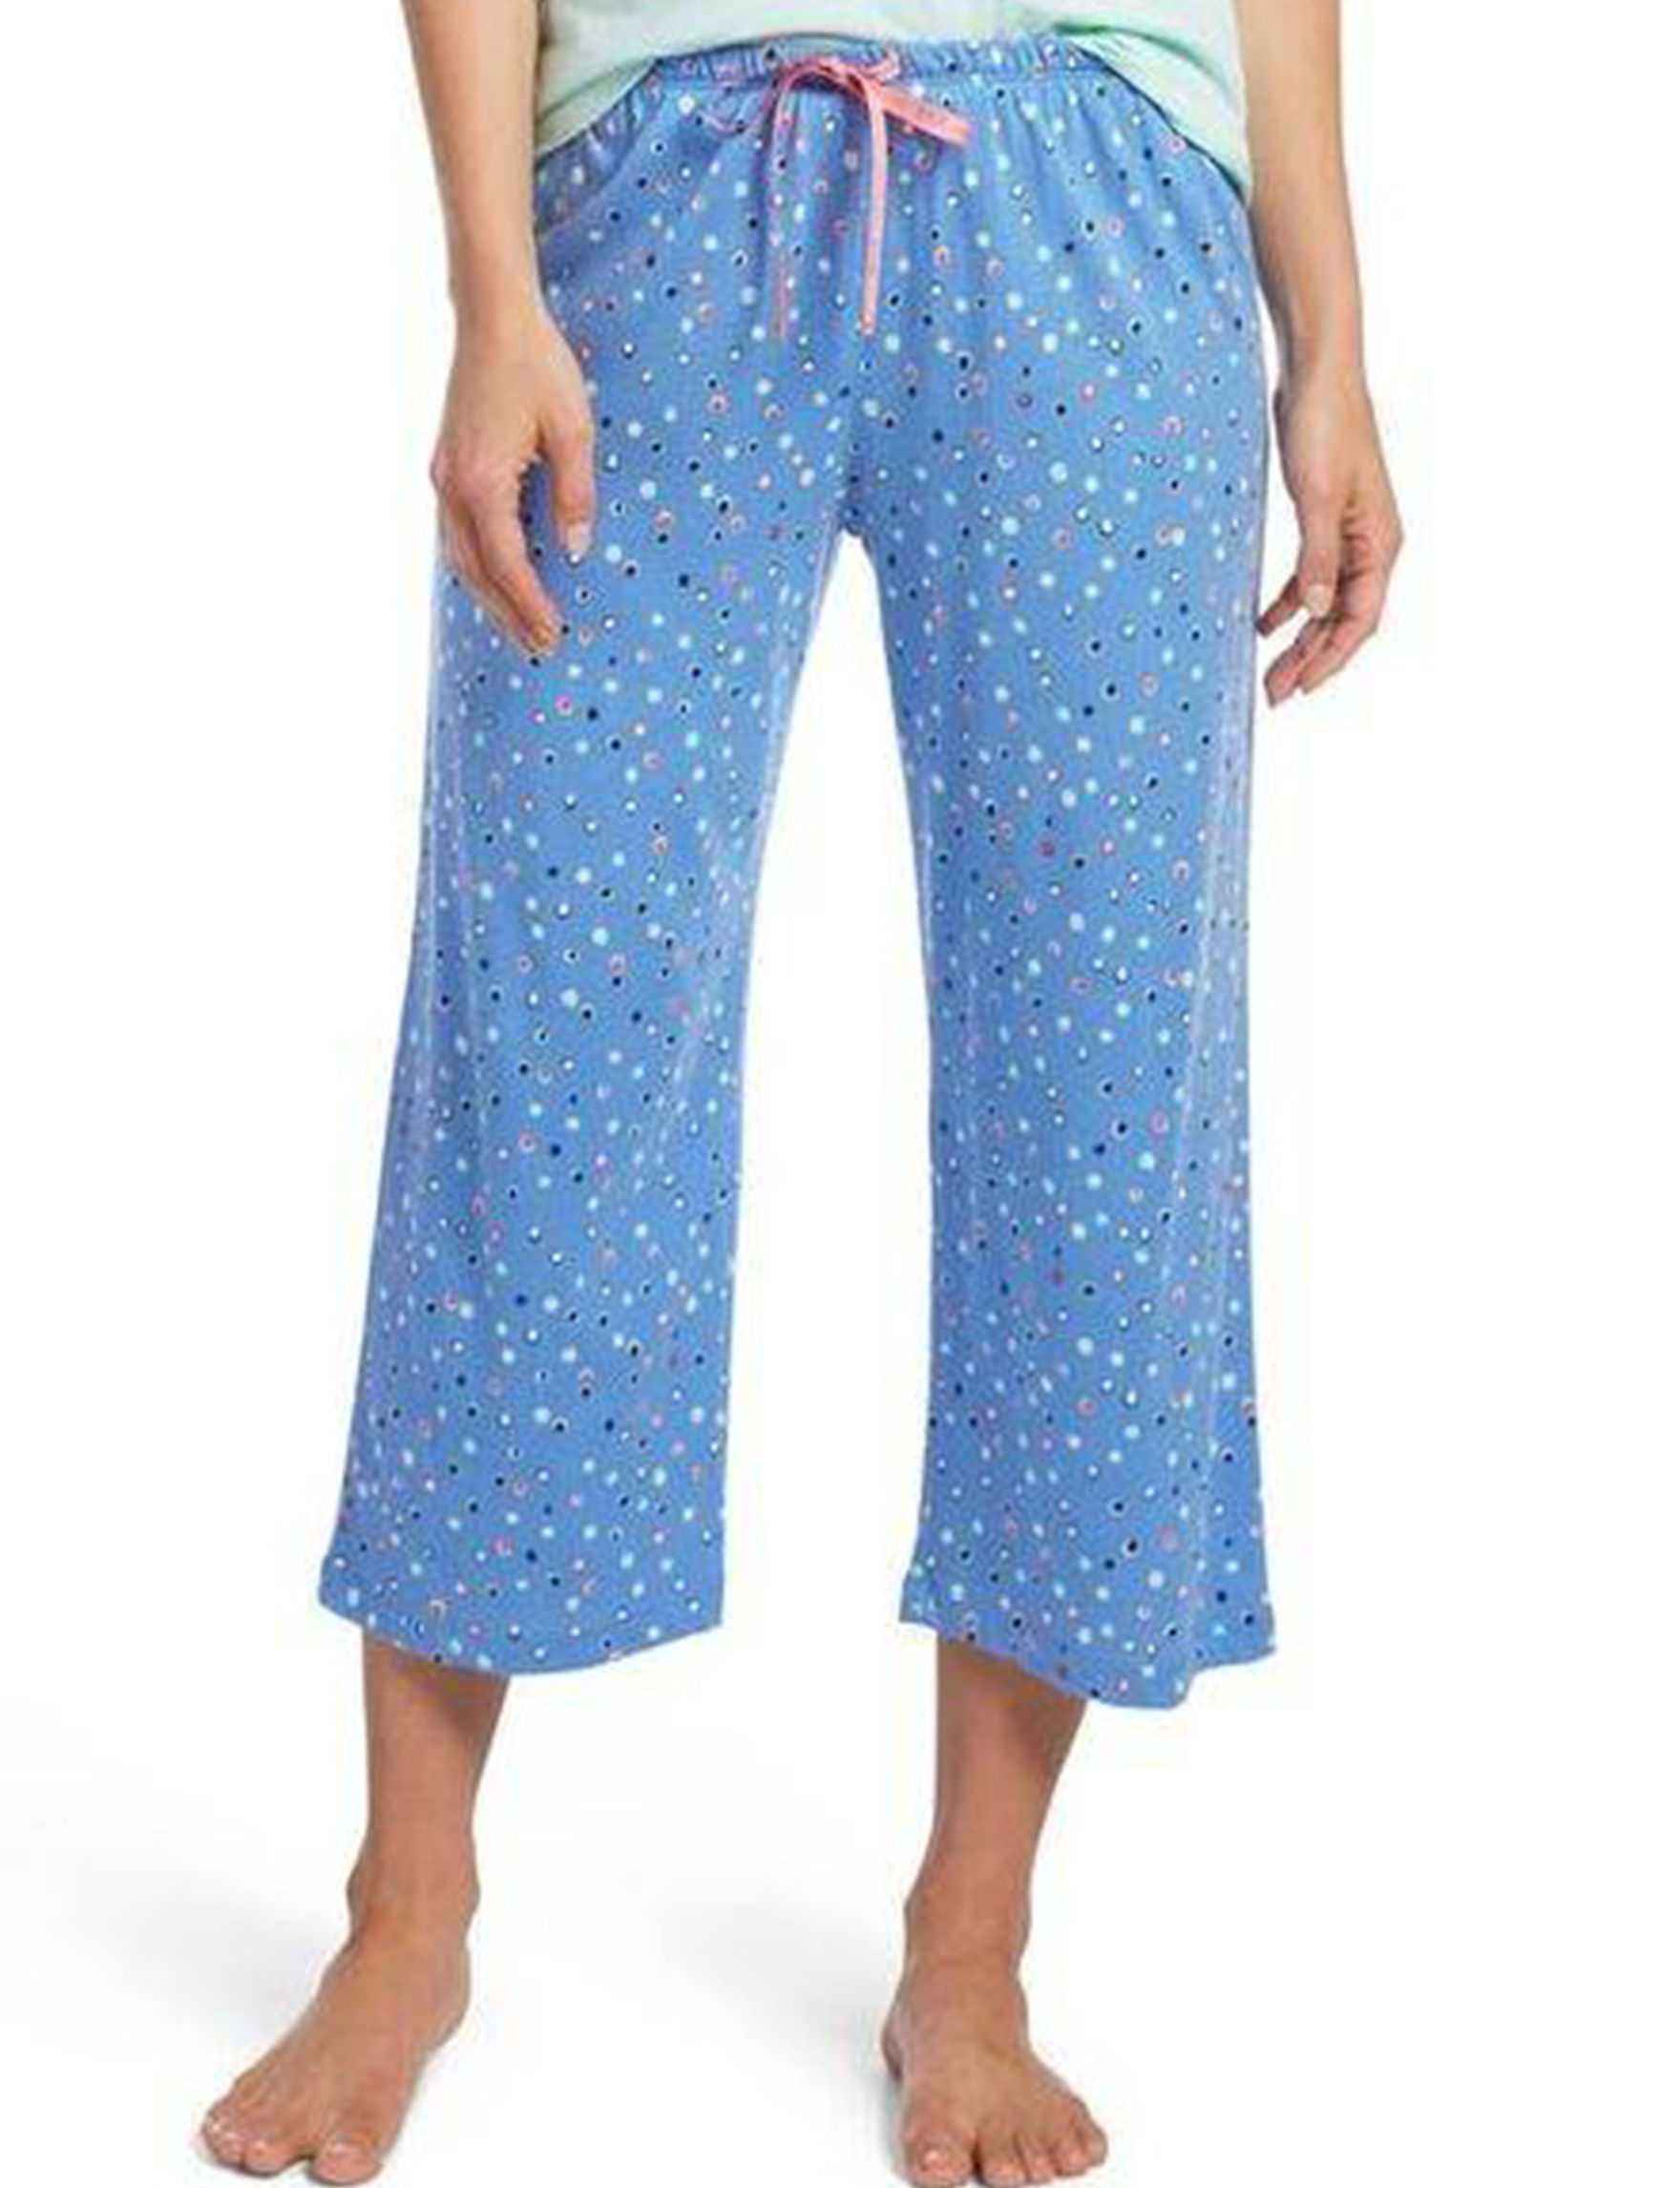 Hue Blue Nightgowns & Sleep Shirts Pajama Bottoms